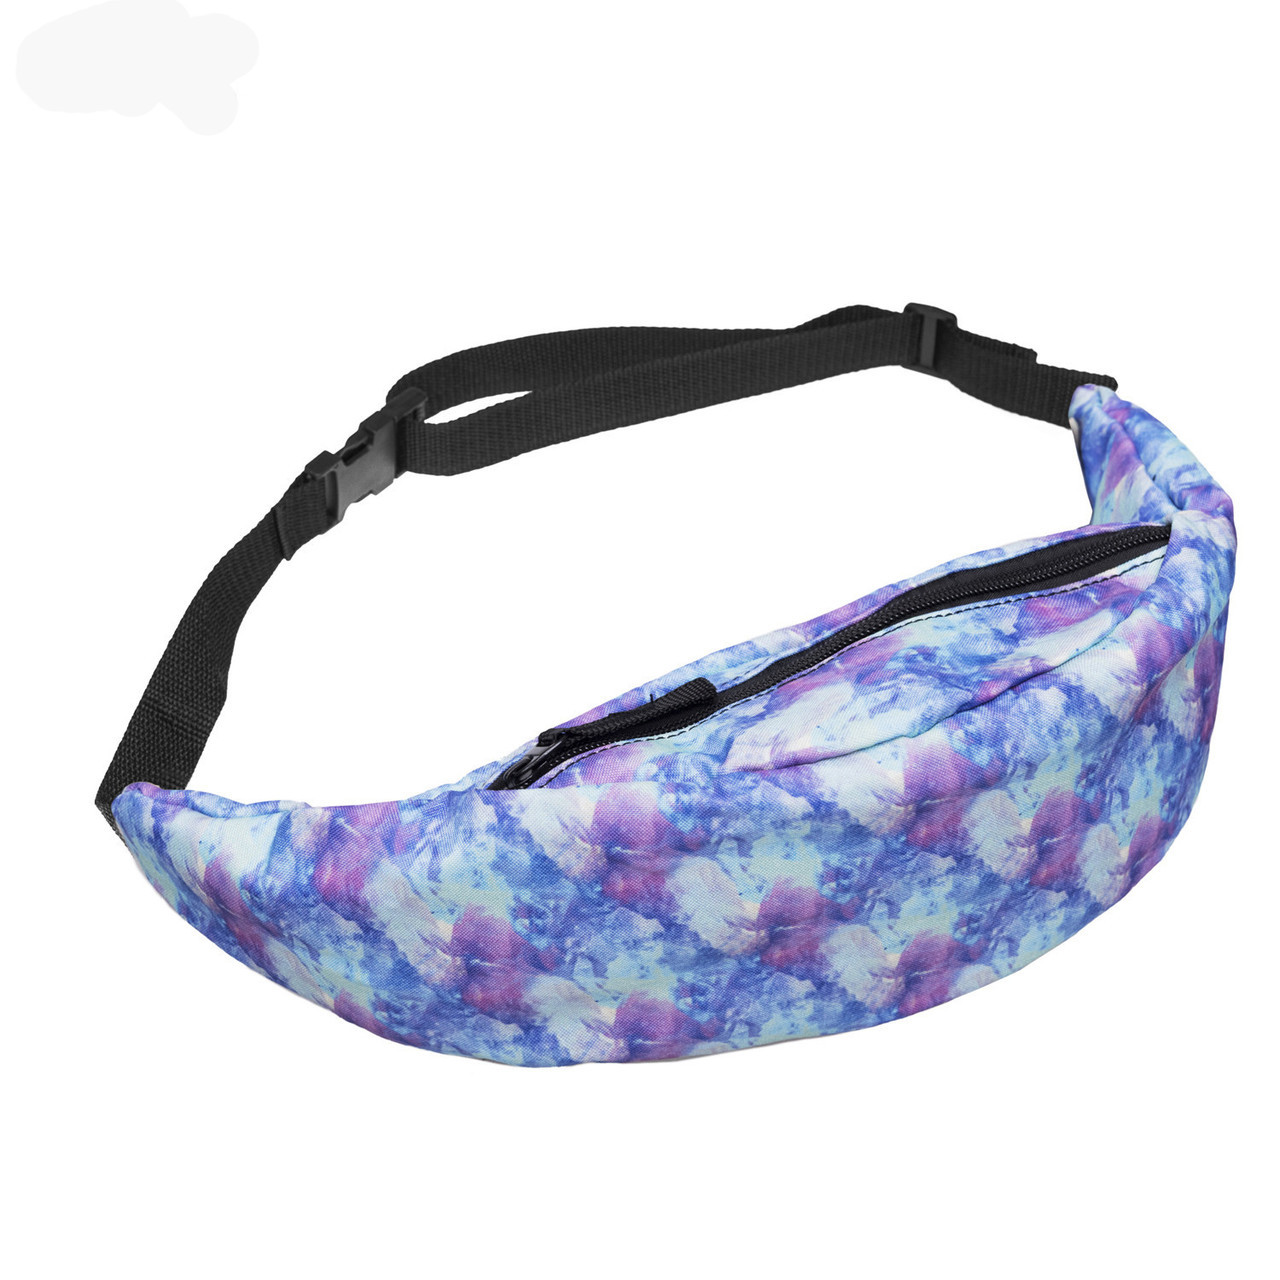 Сумка на пояс Бананка Zohra Фиолетовые Облака